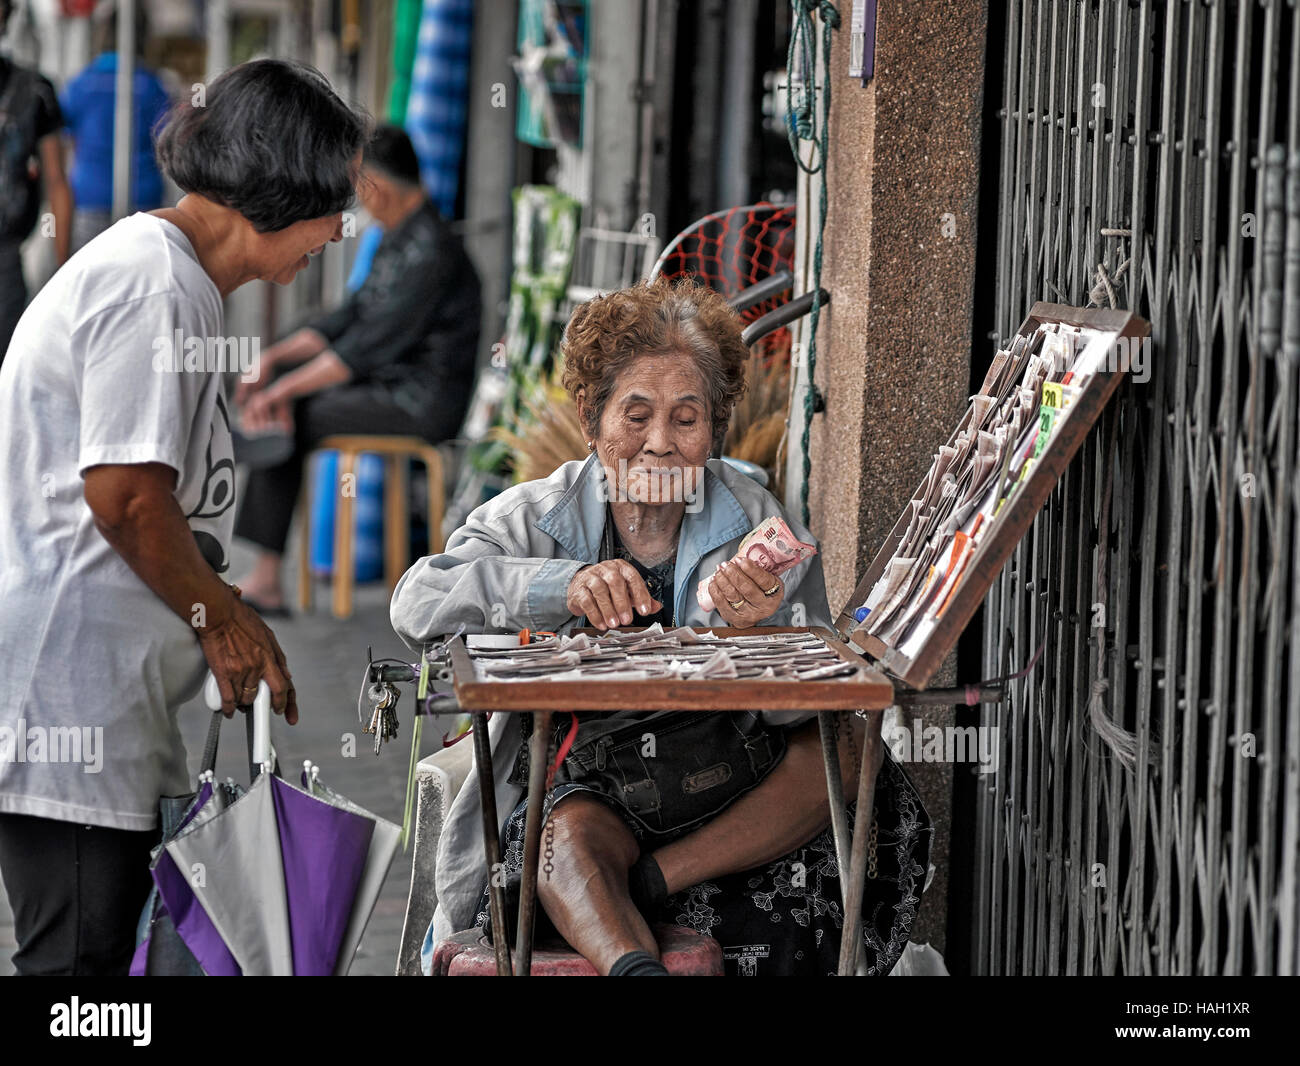 Thai street scene with elderly female lottery vendor with customer. Thailand S. E. Asia - Stock Image